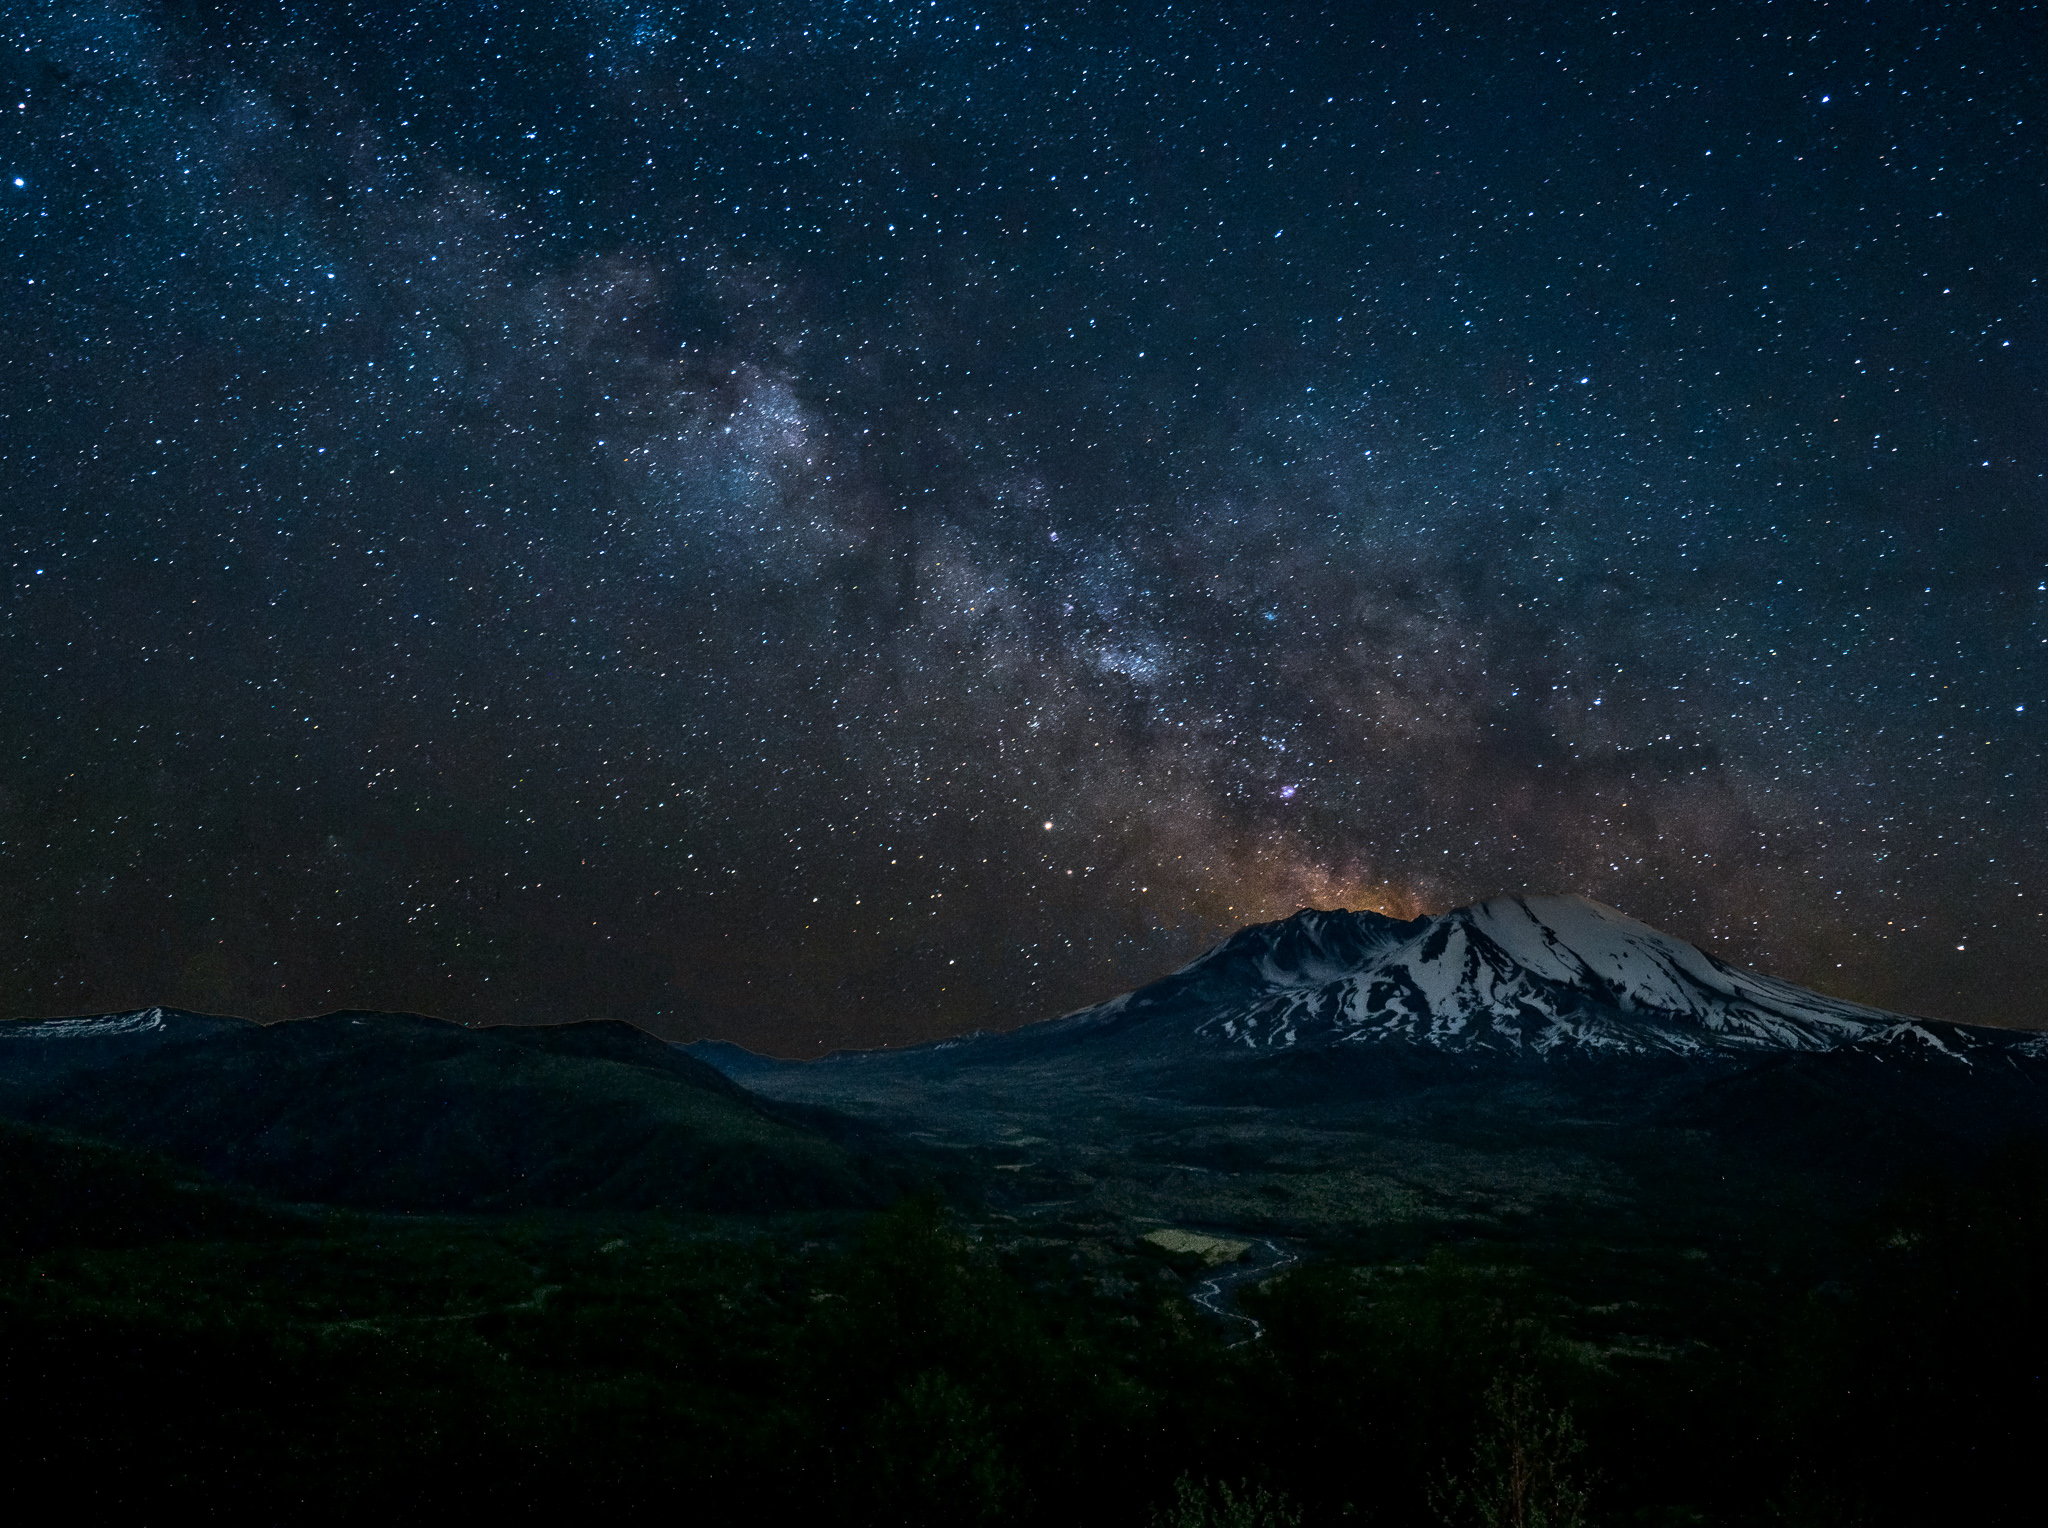 Starry Night at Mount Saint Helens